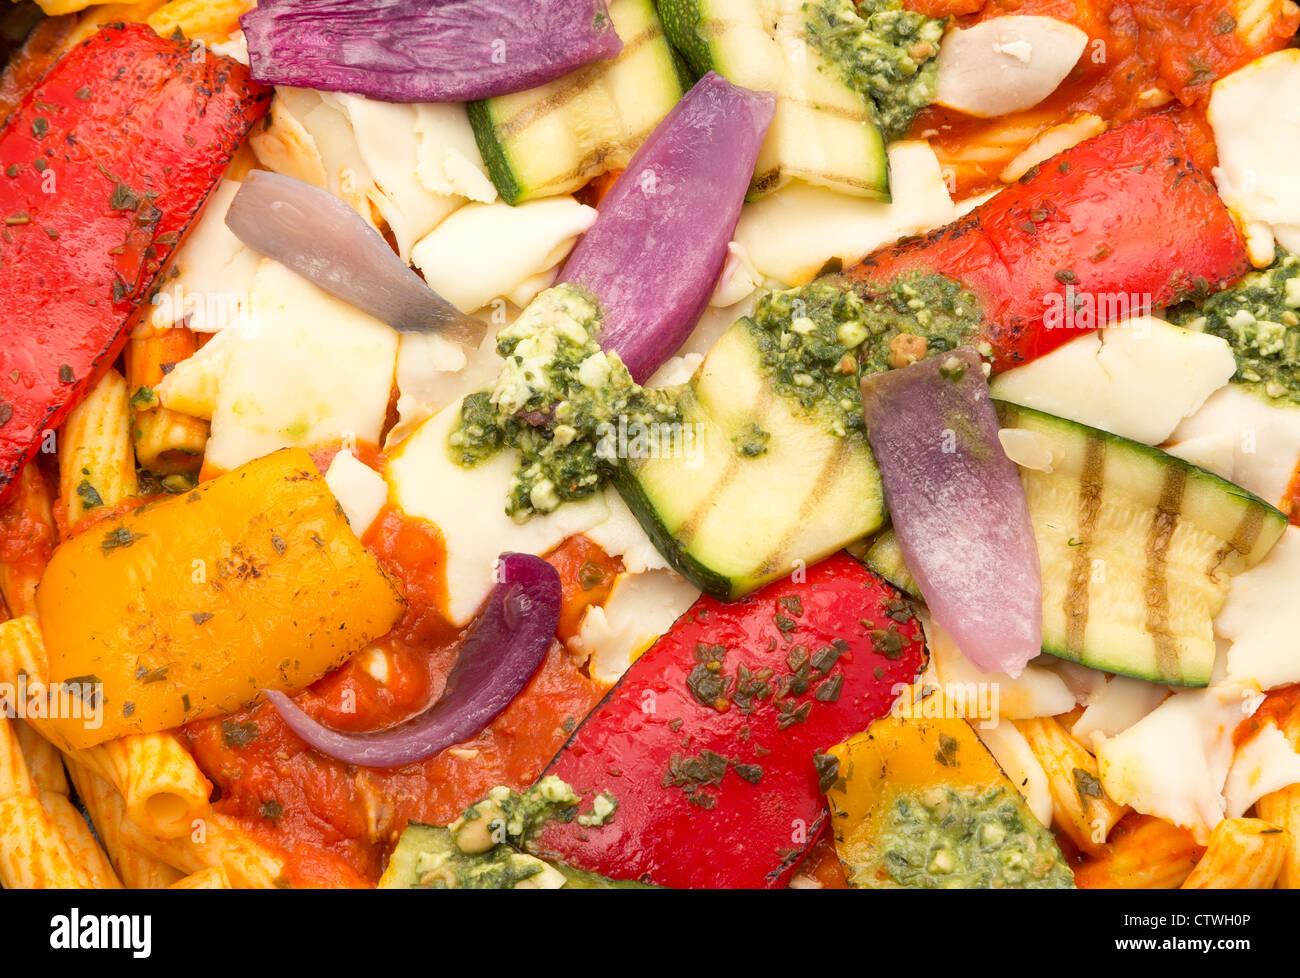 Vegetable pasta bake close-up - studio shot - Stock Image